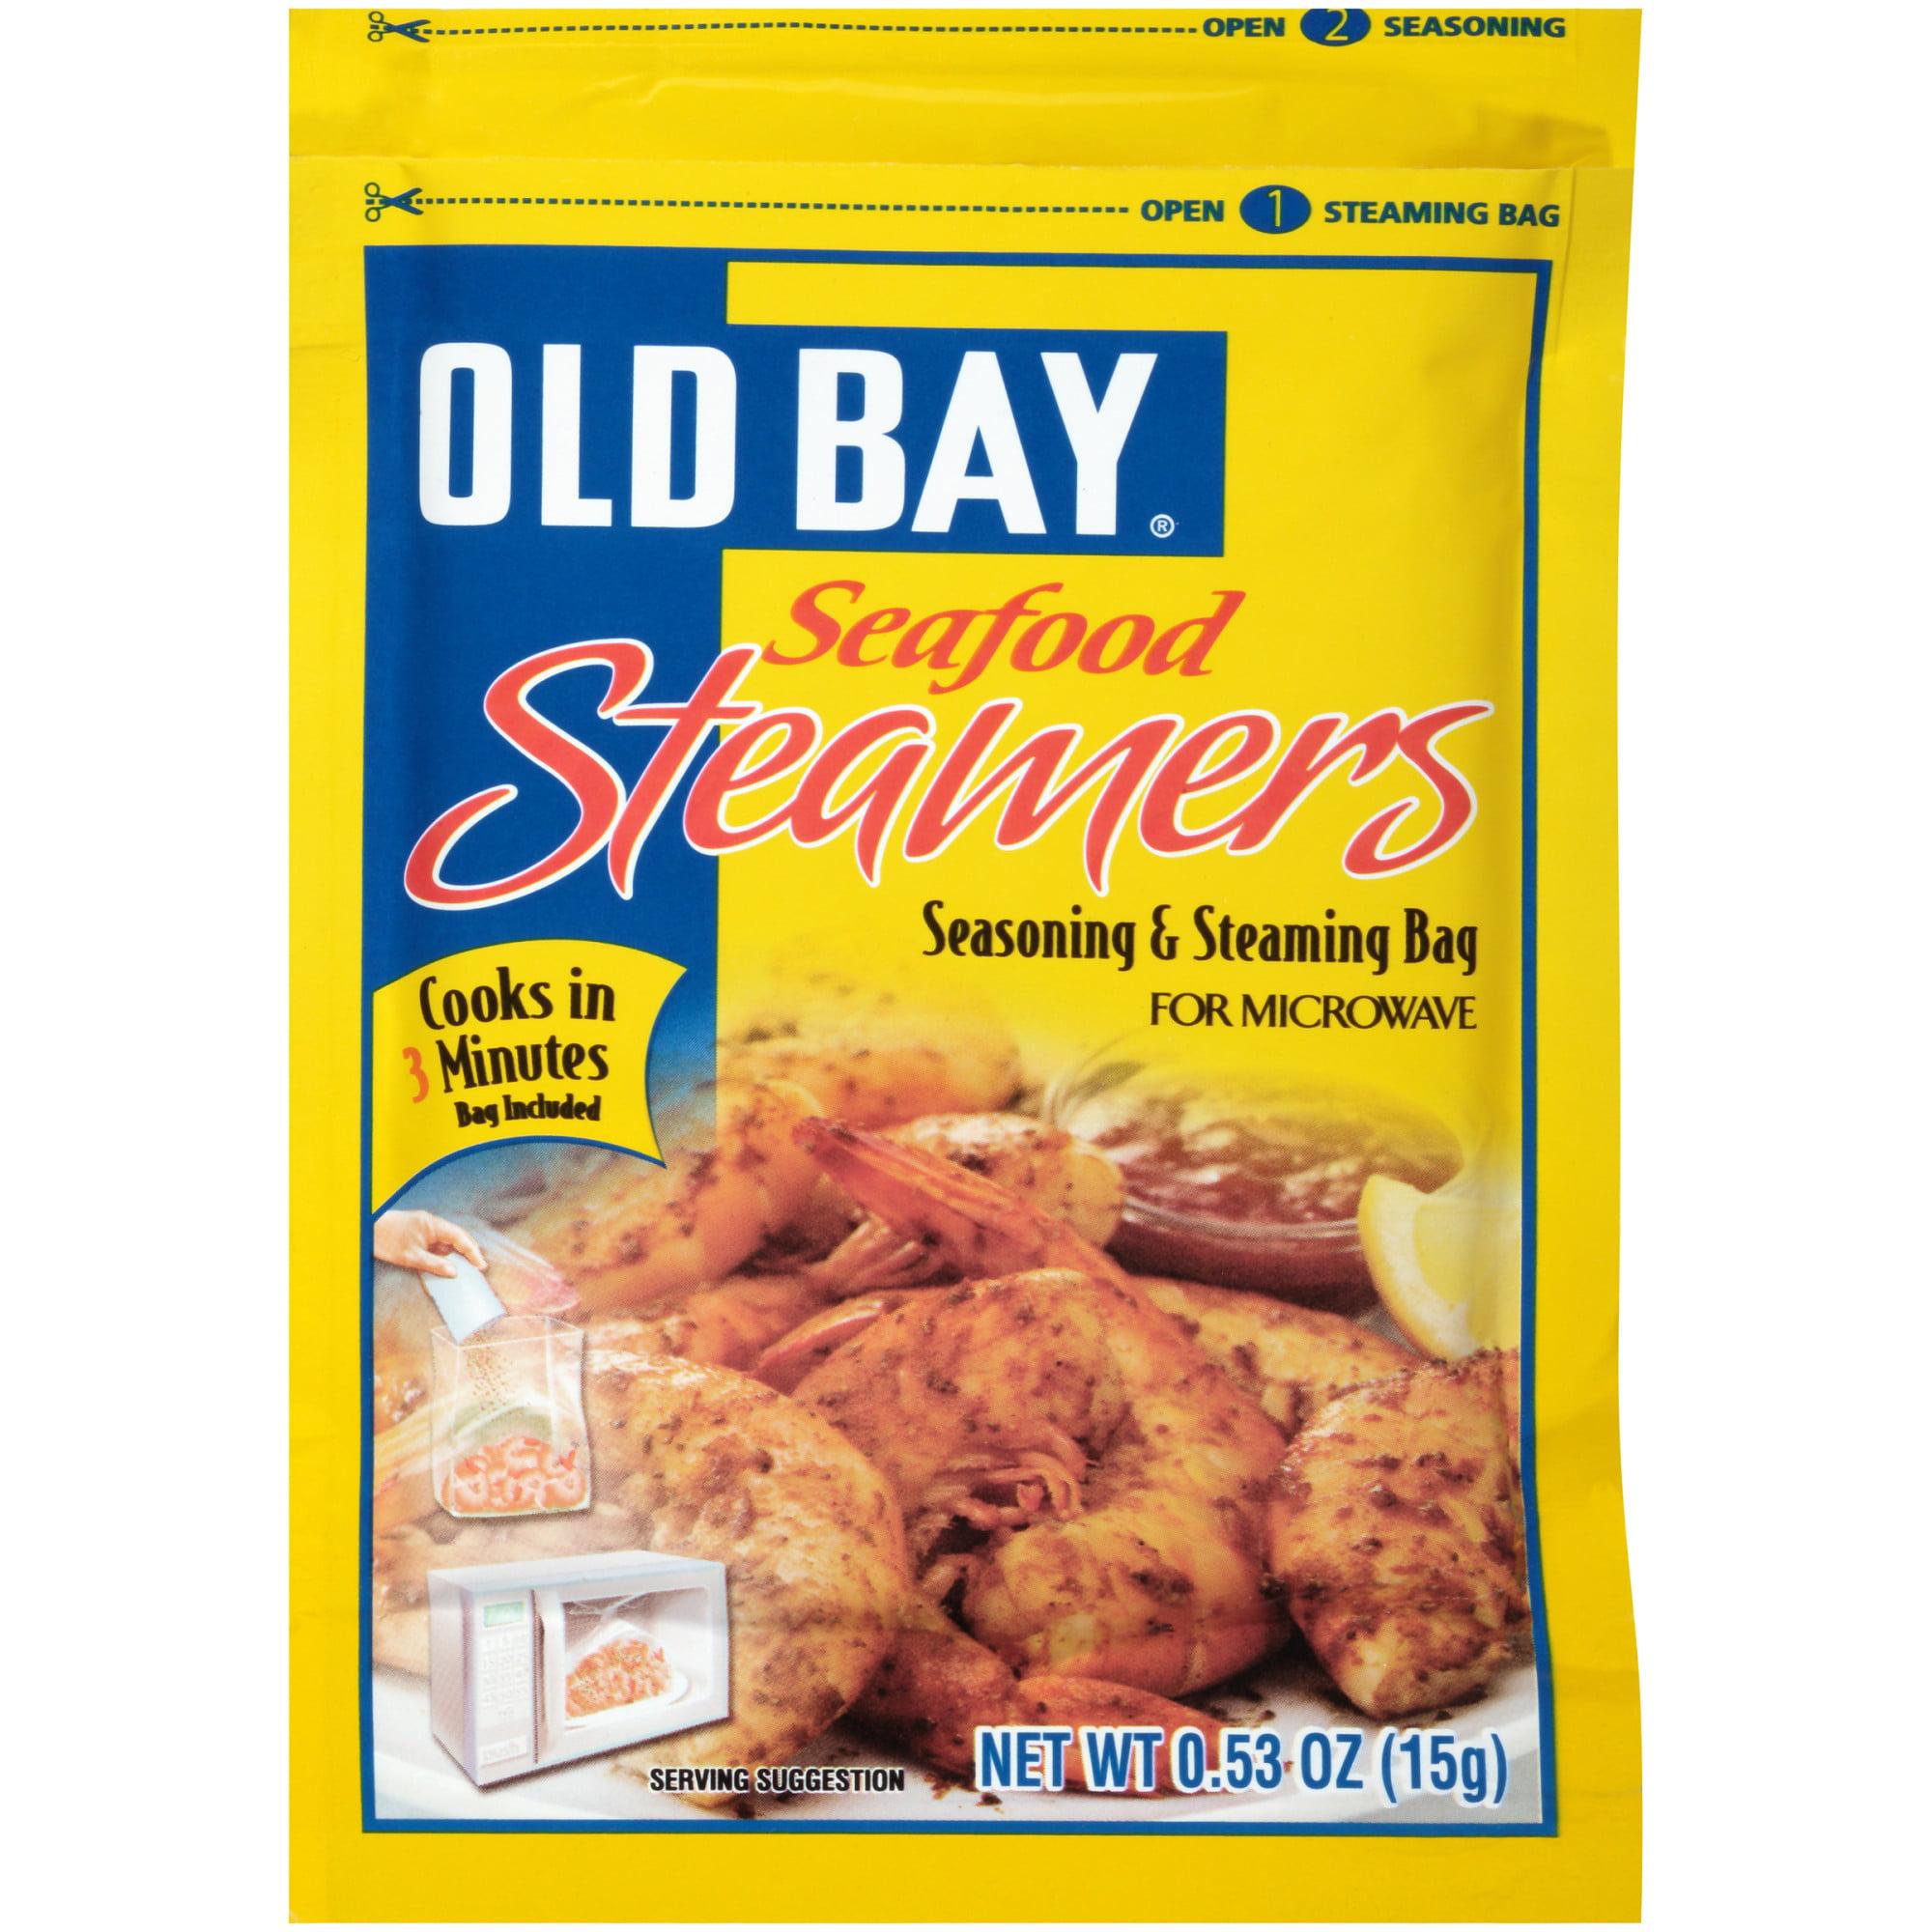 OLD BAY Seafood Steamers Seasoning And Steaming Bag, 0.53 OZ